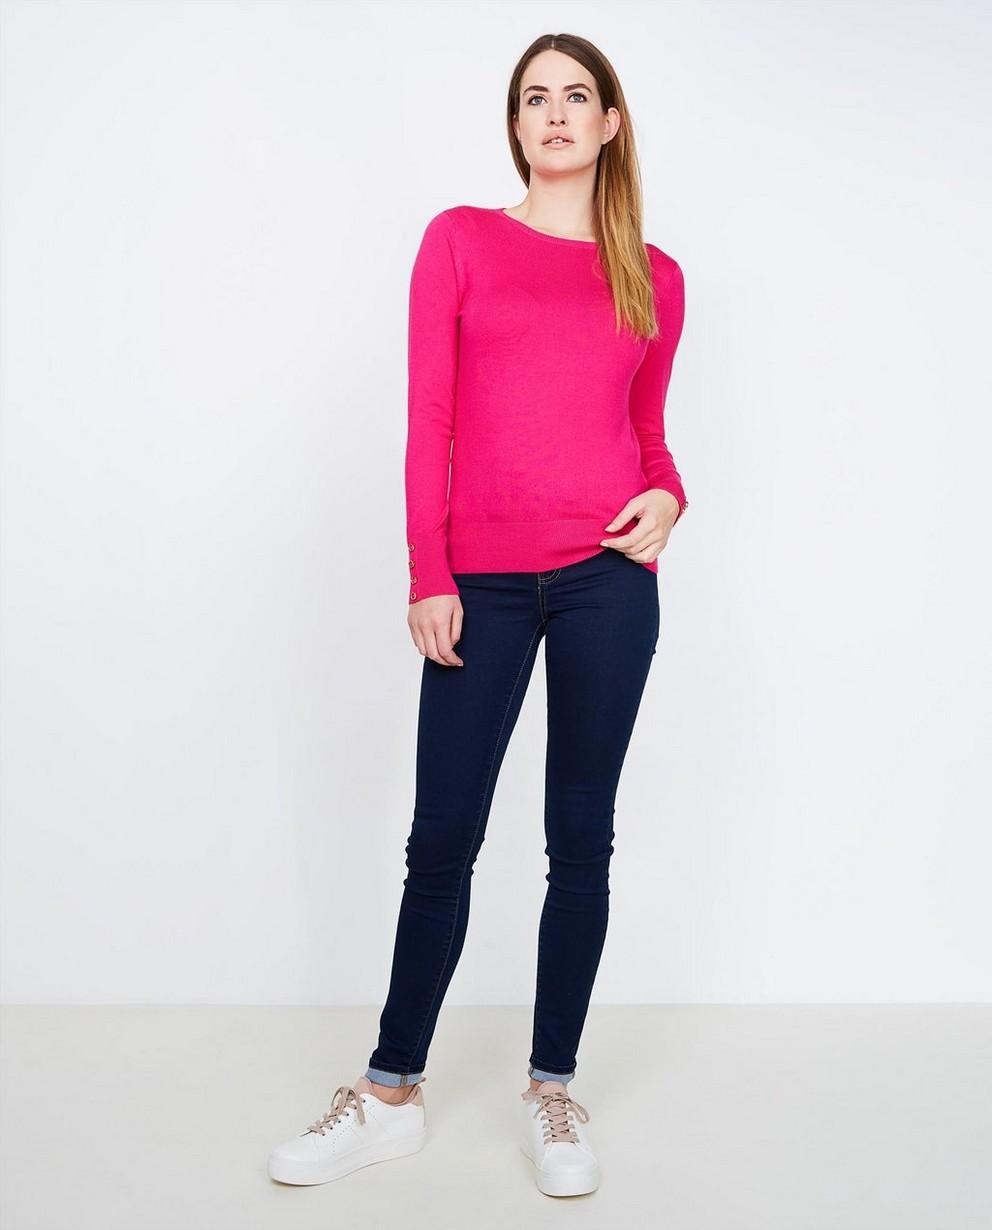 Jeans - BLM - Super skinny jeans